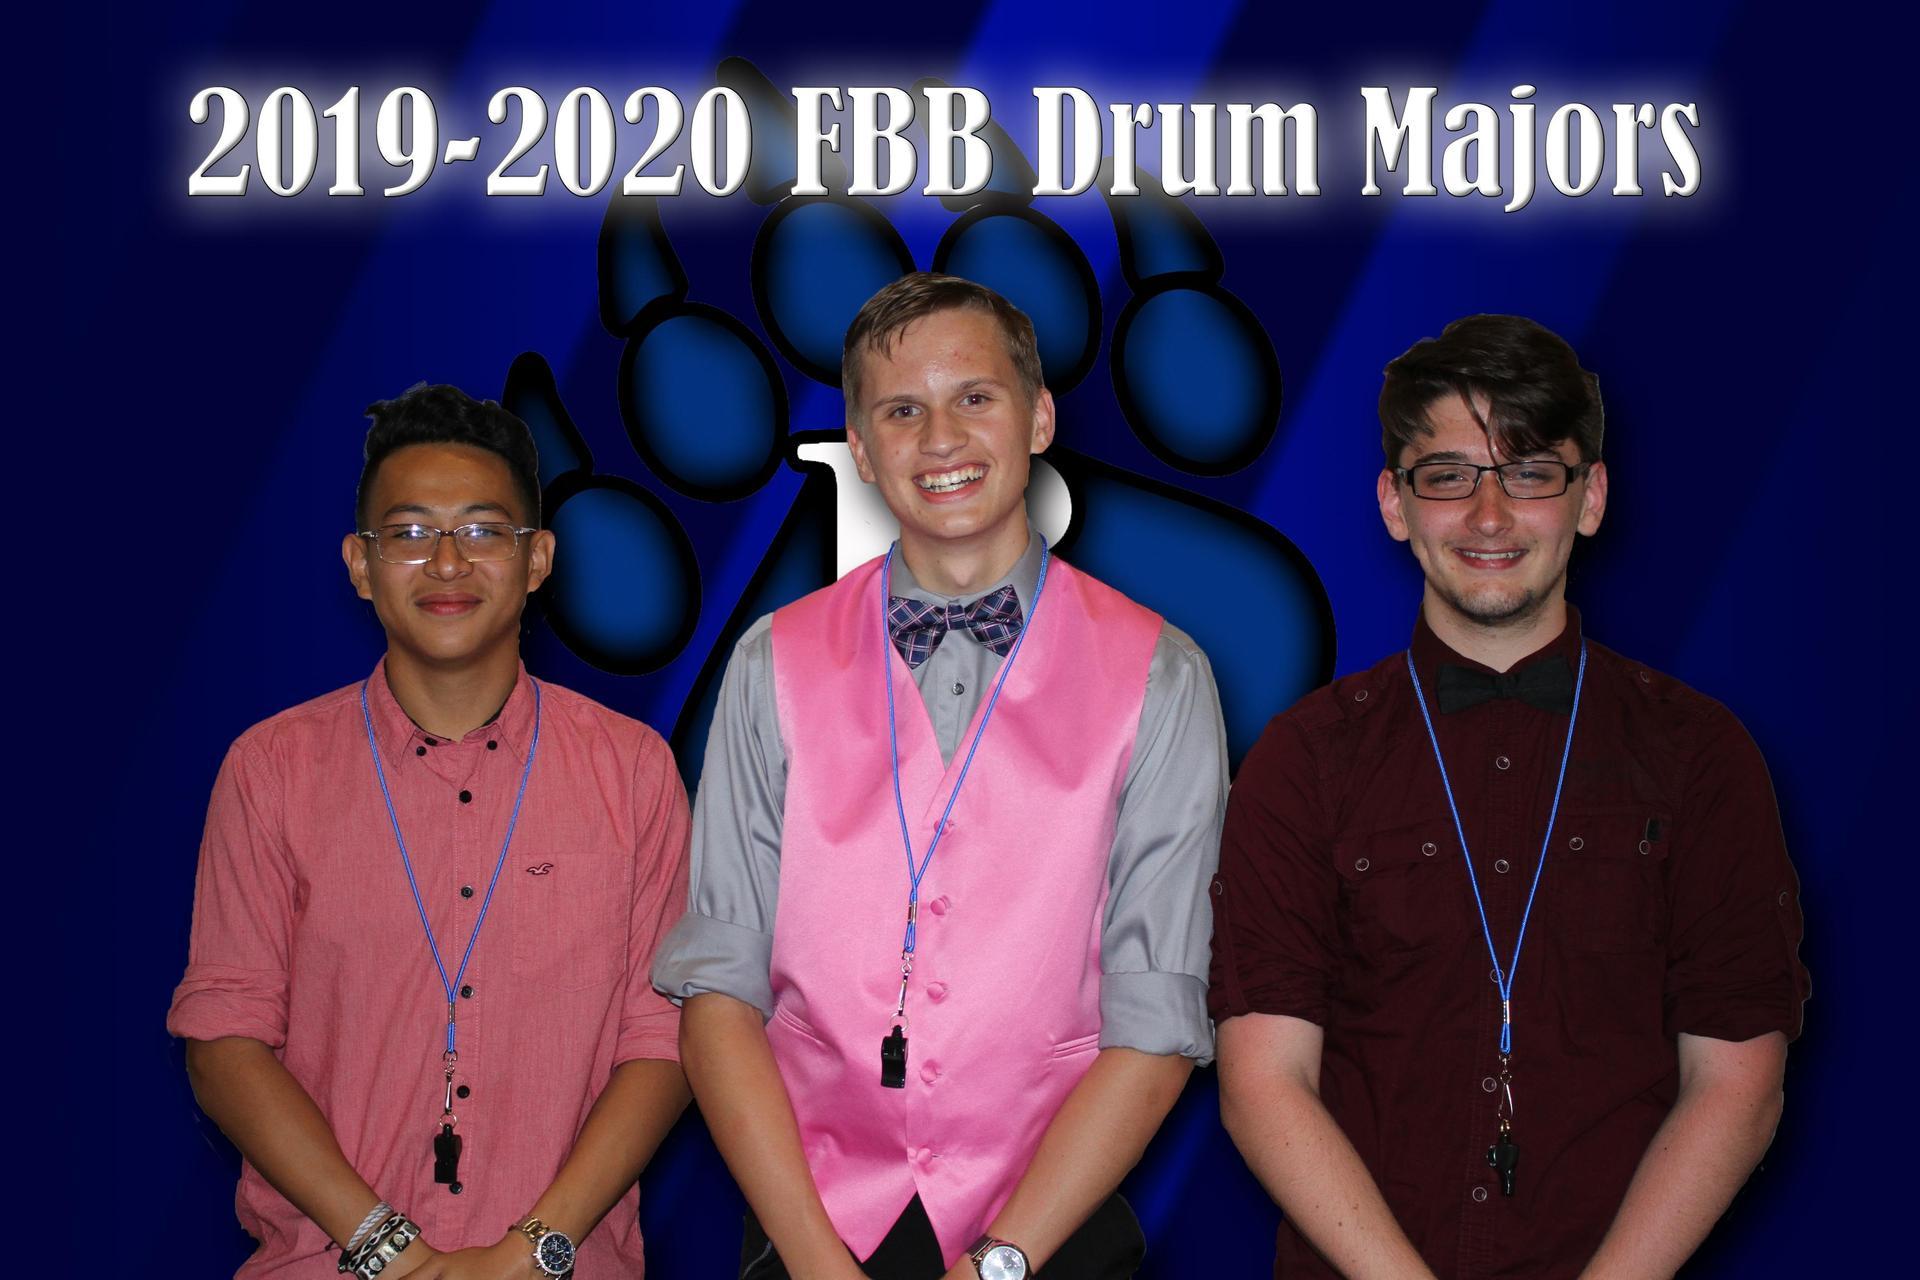 2019 Drum Majors